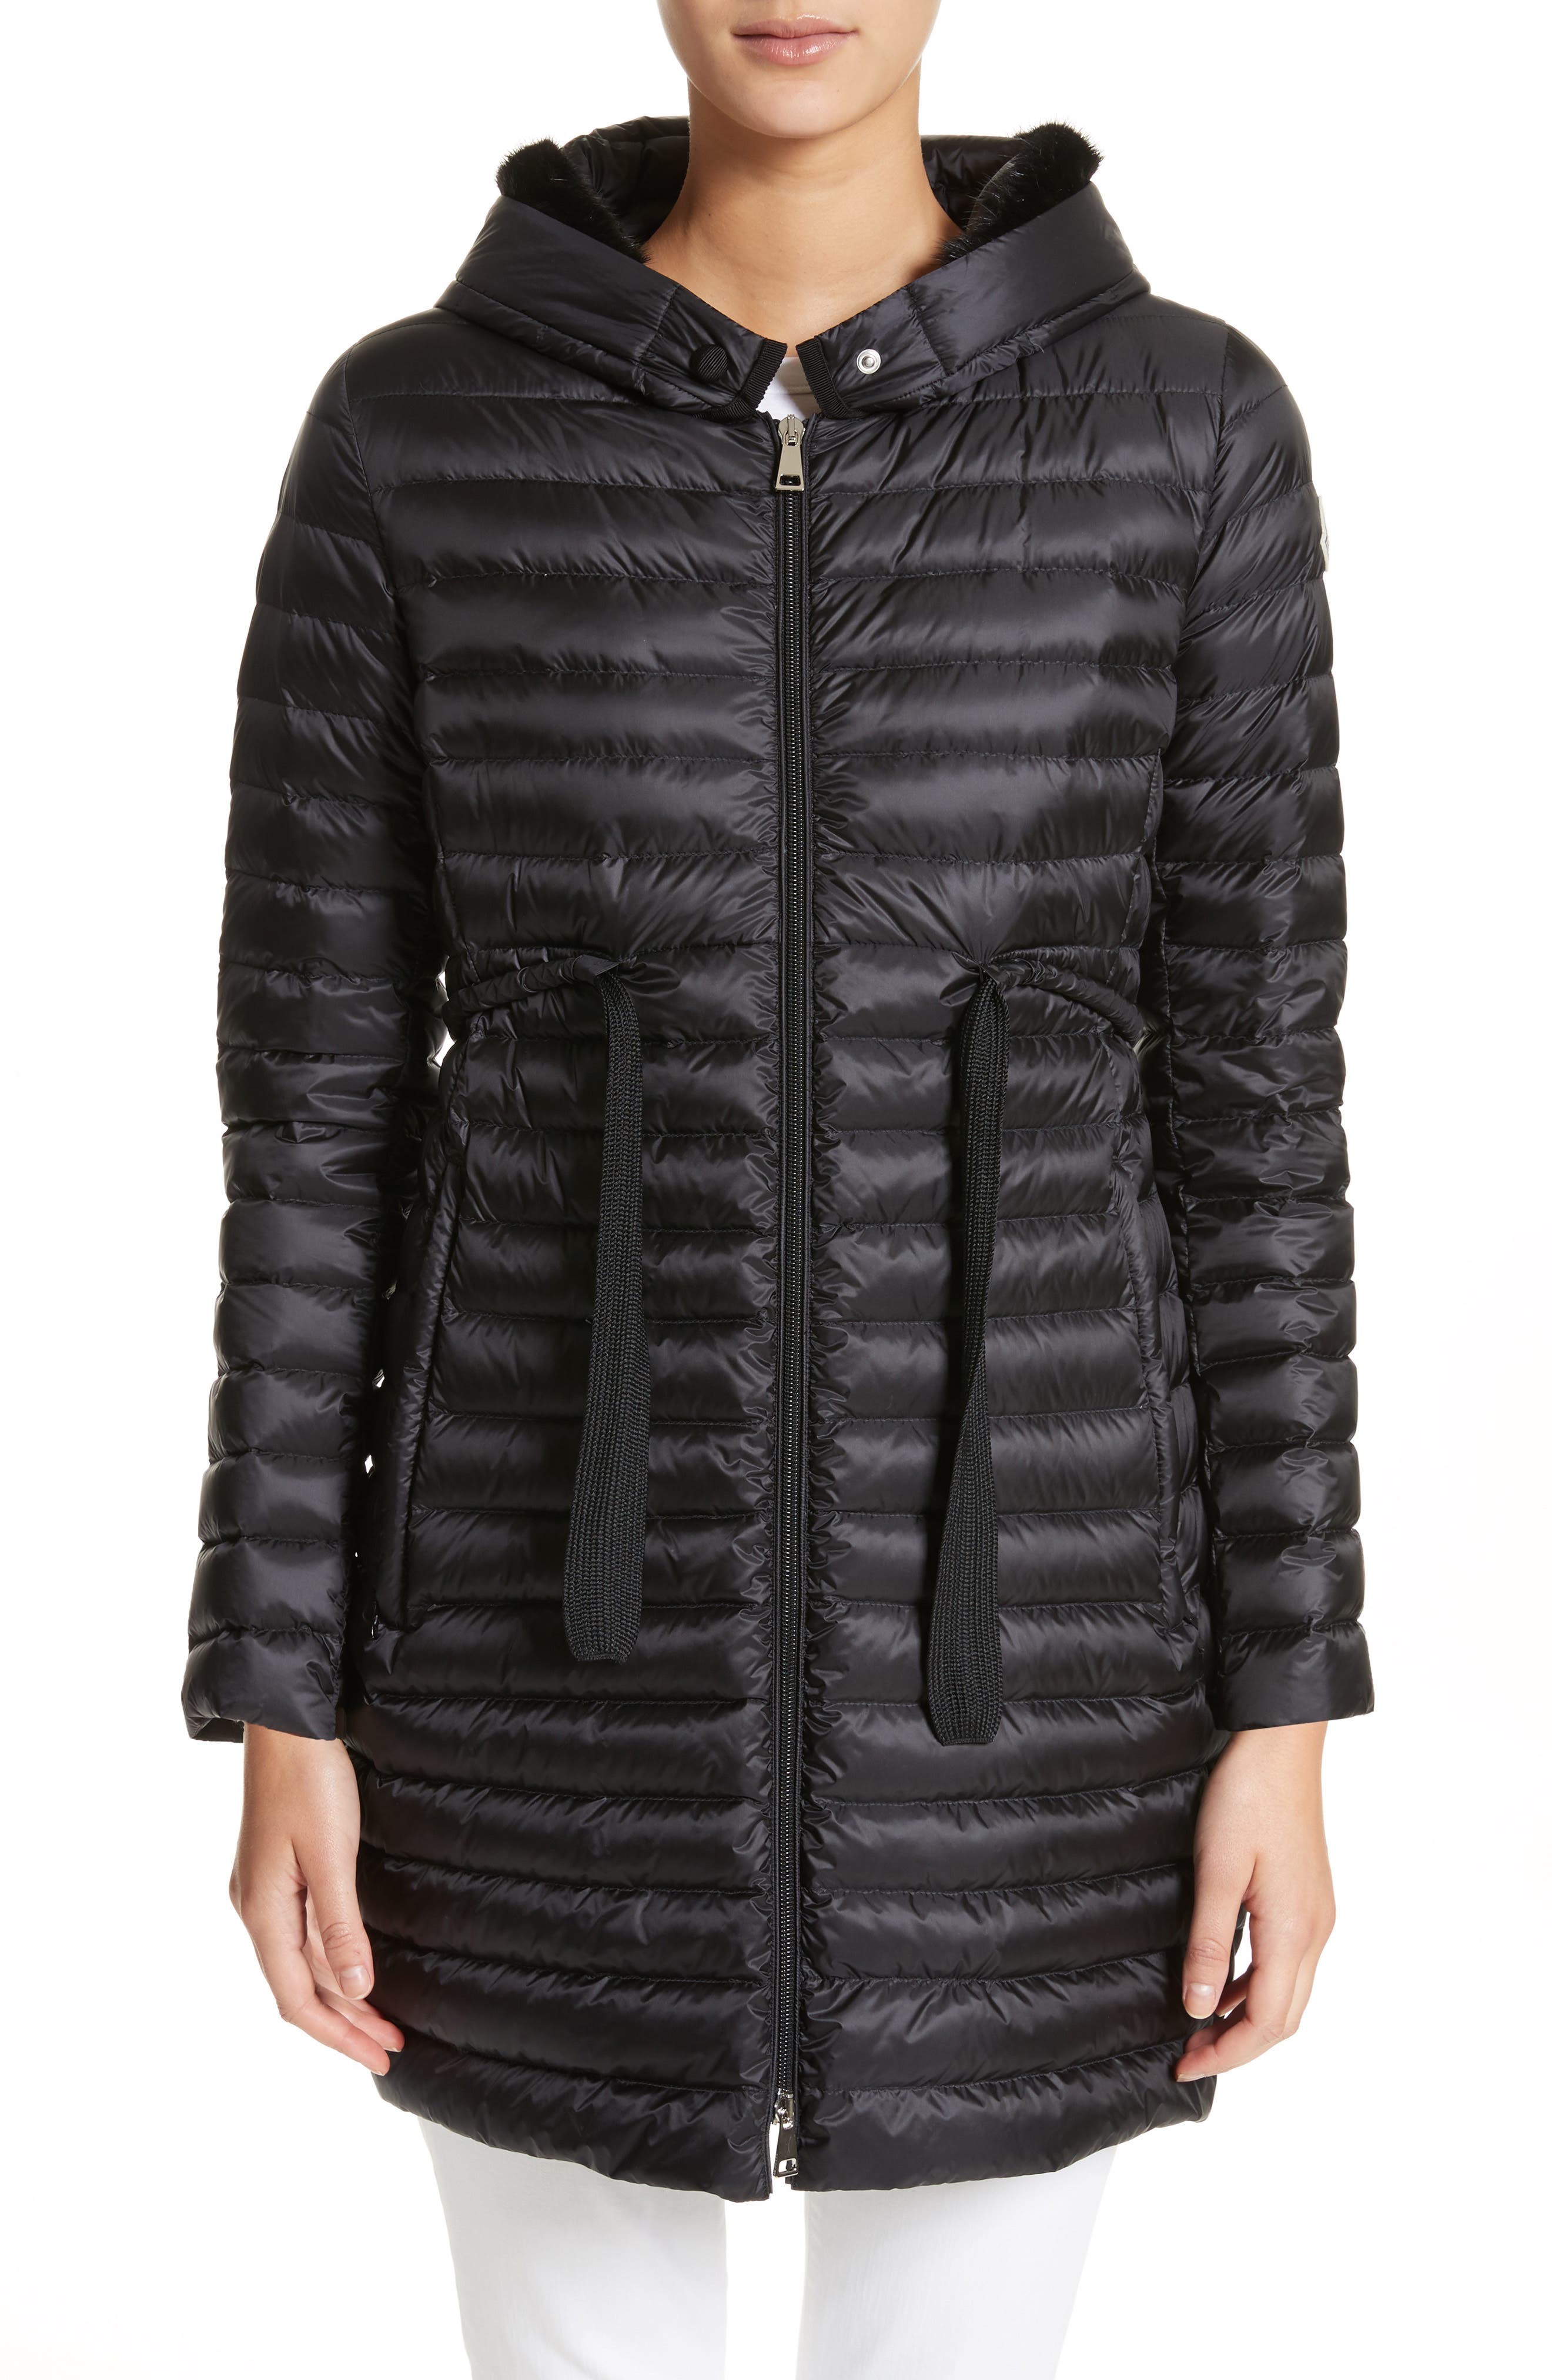 Barbel Hooded Down Coat with Genuine Mink Fur Trim,                         Main,                         color, 001